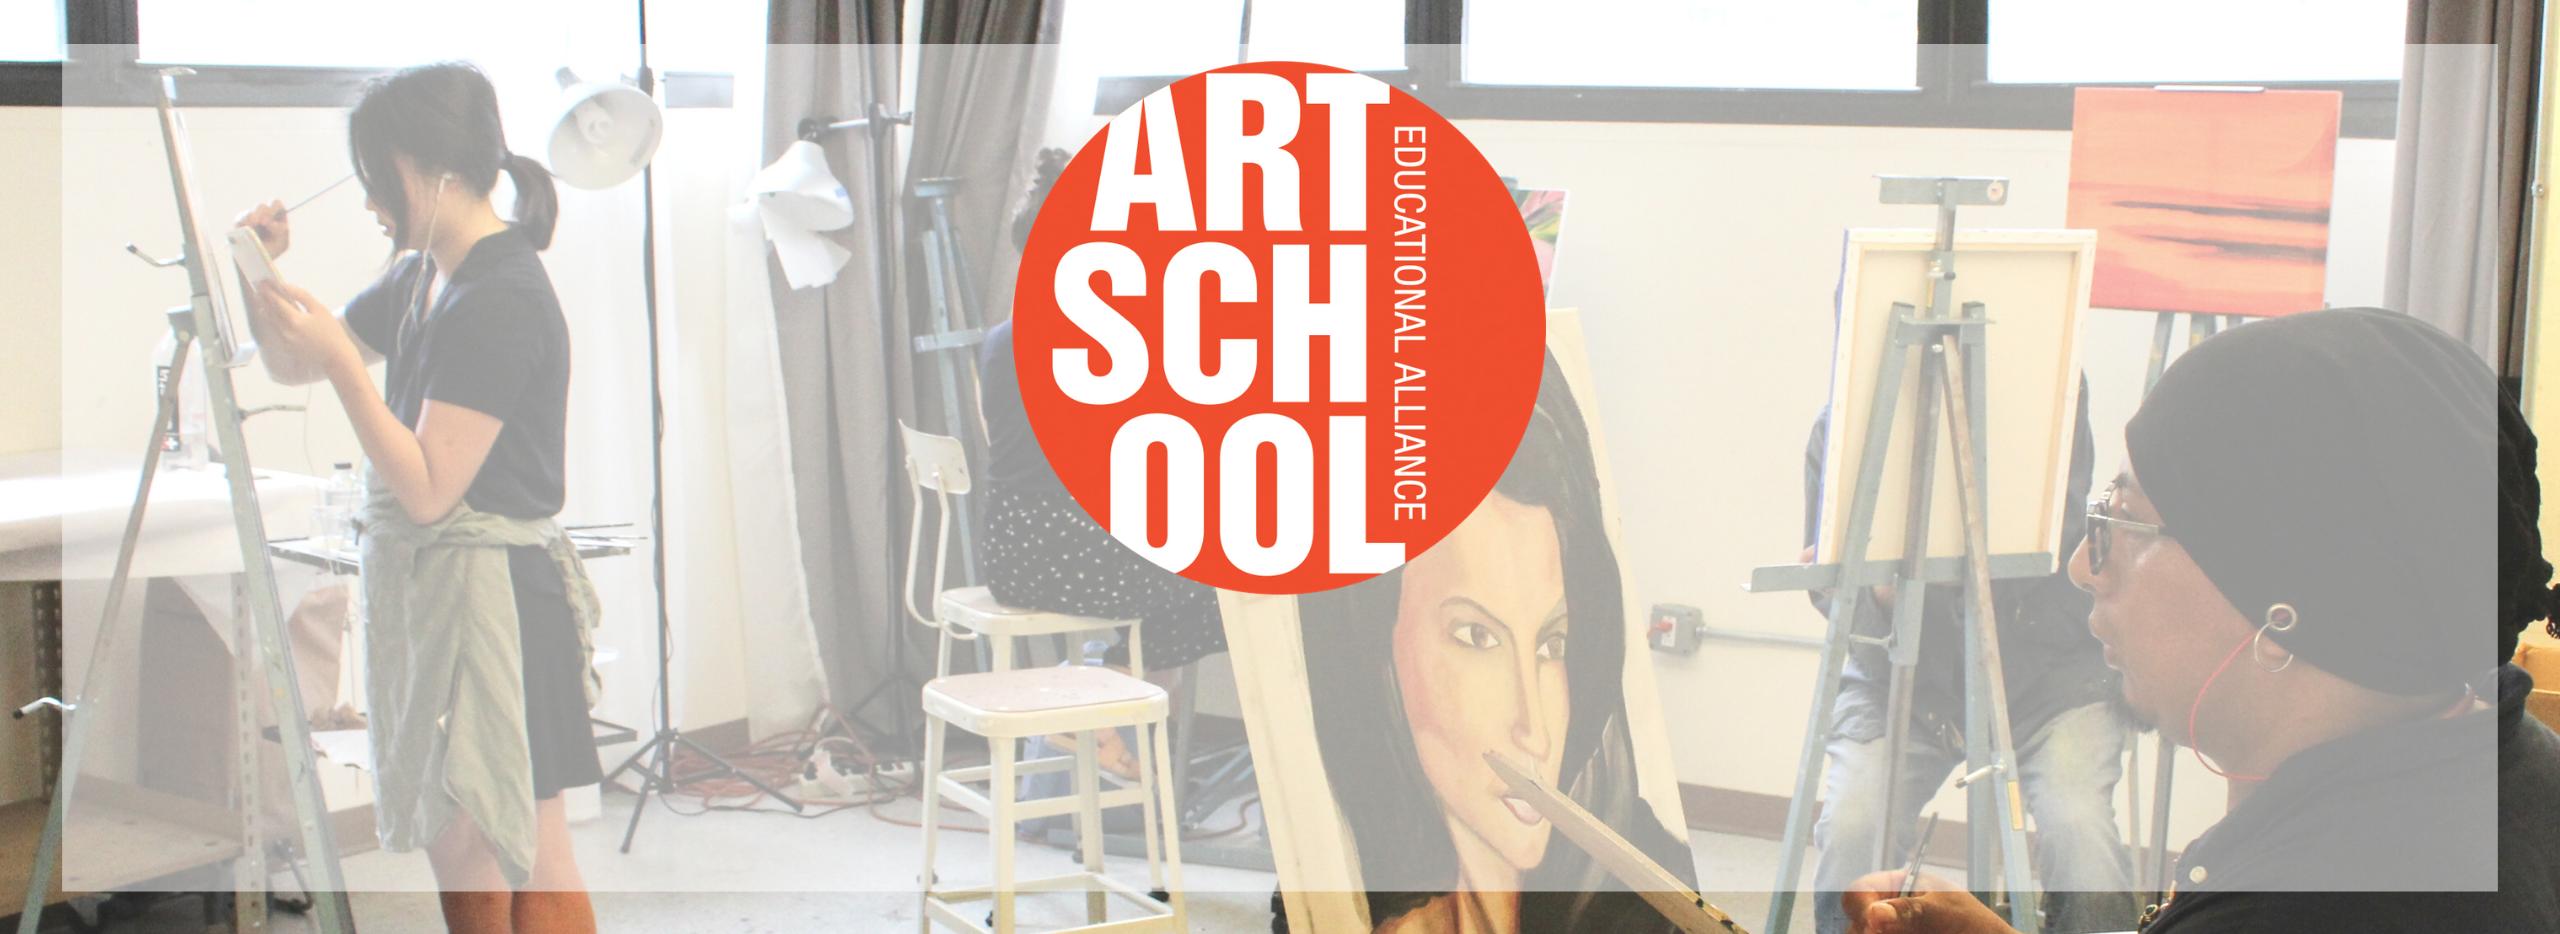 Art School Header Image